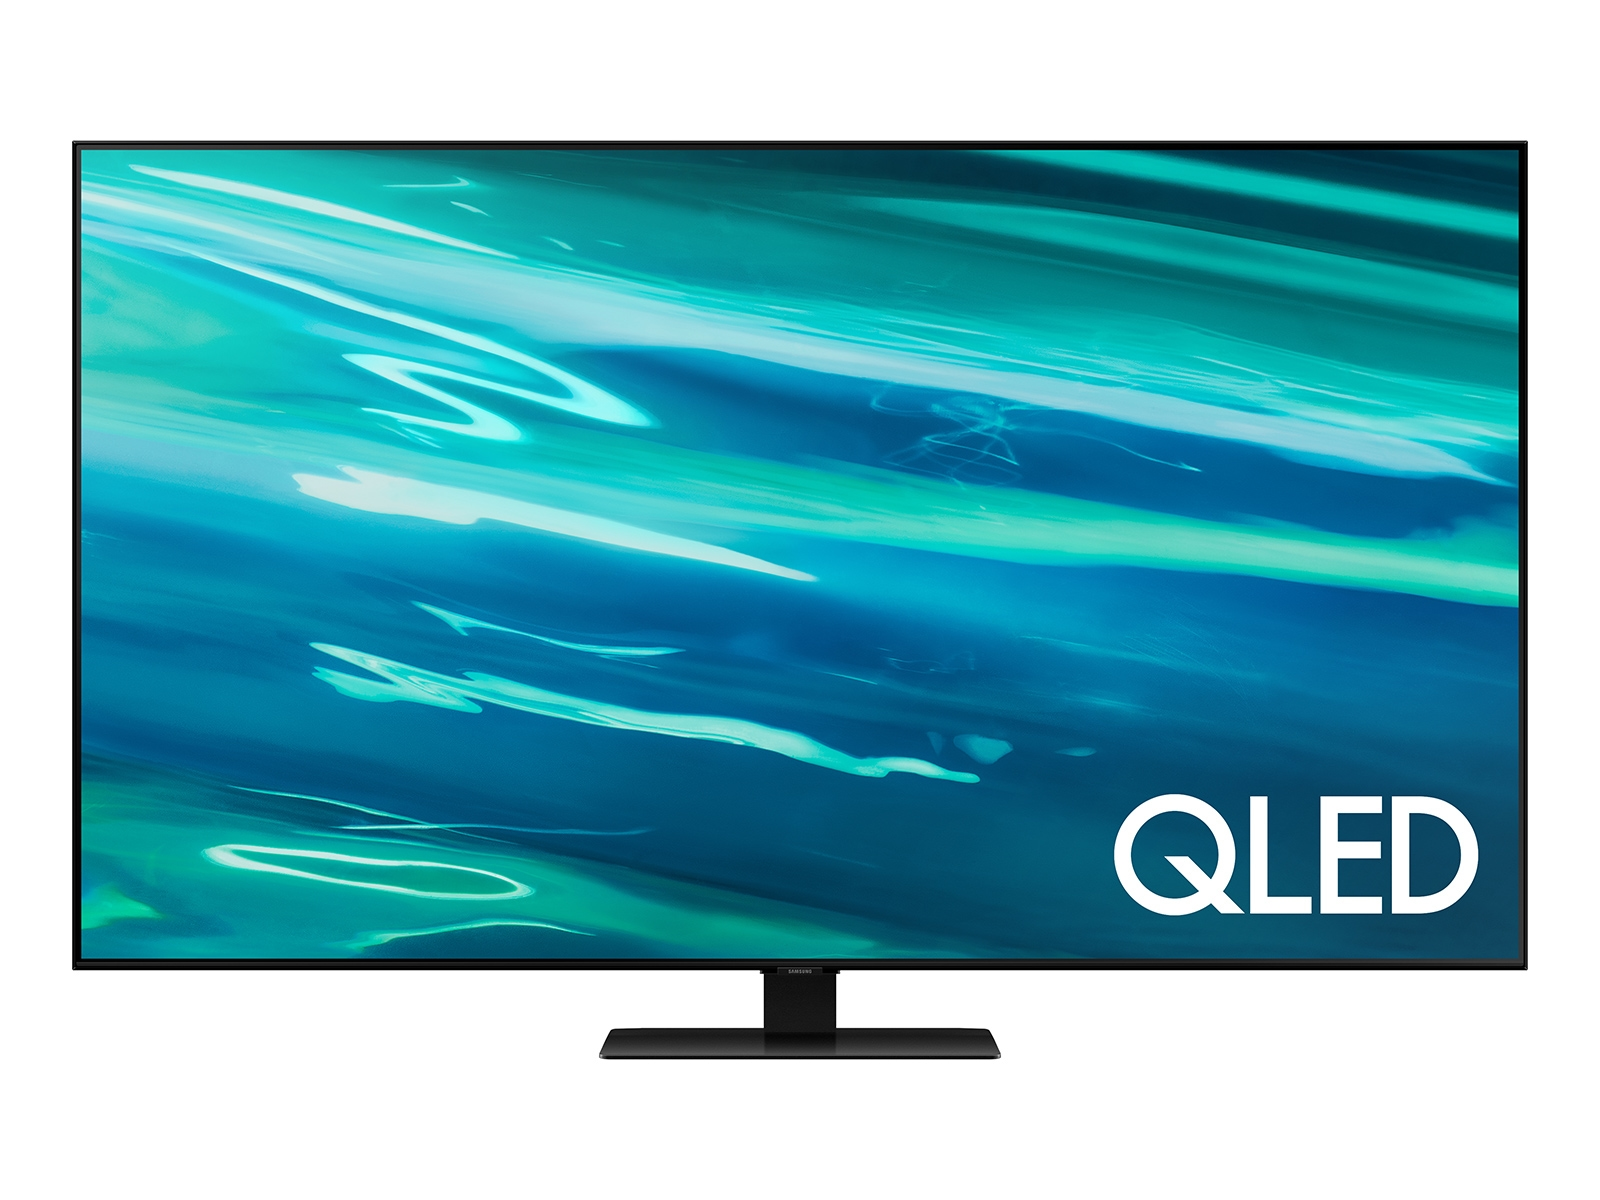 Samsung 85 Q80A QLED 4K Smart TV, QN85Q80AAFXZA, 2021